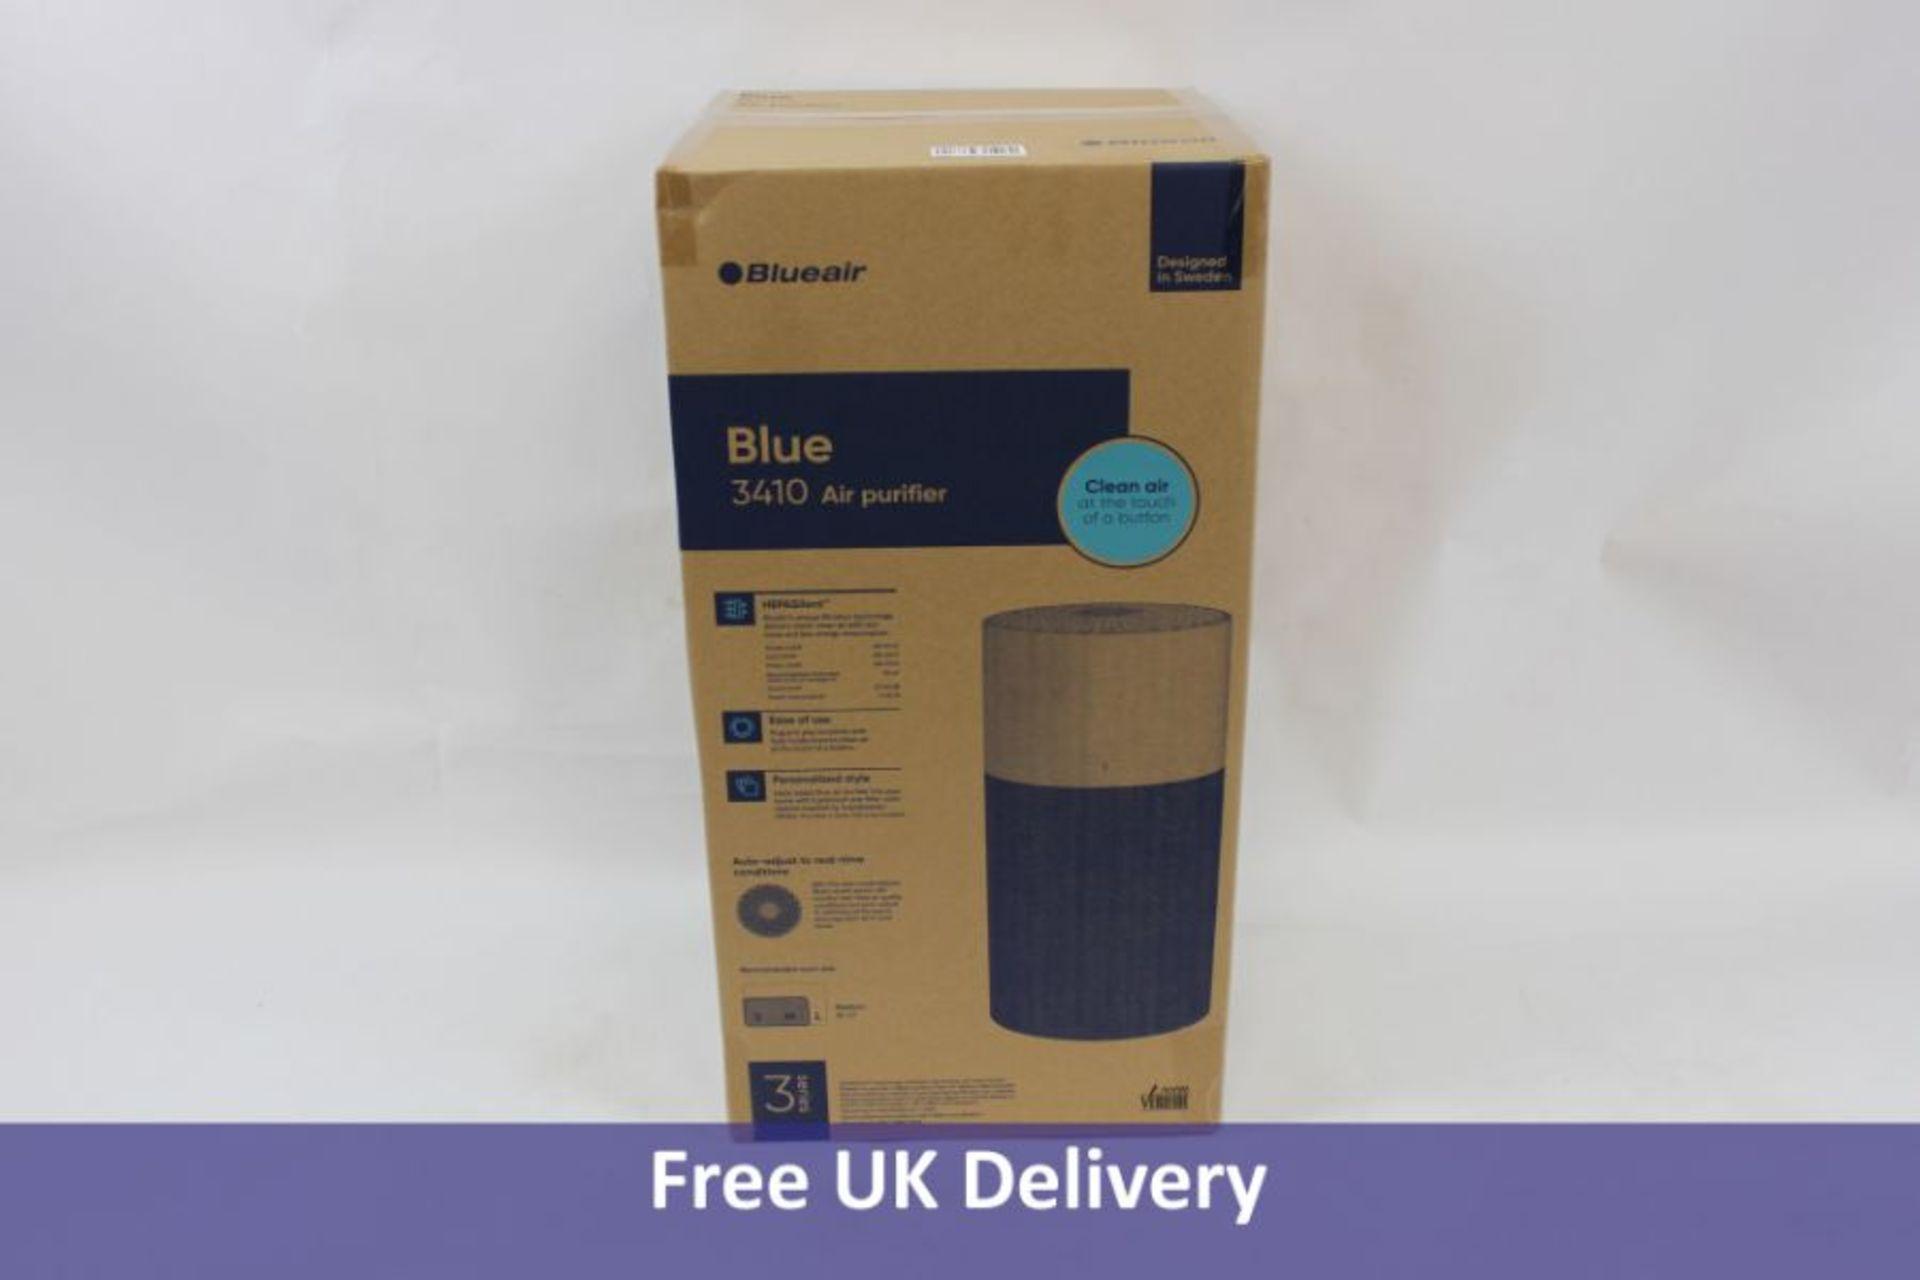 Blueair 3410Blue Air Purifier with HEPASilent